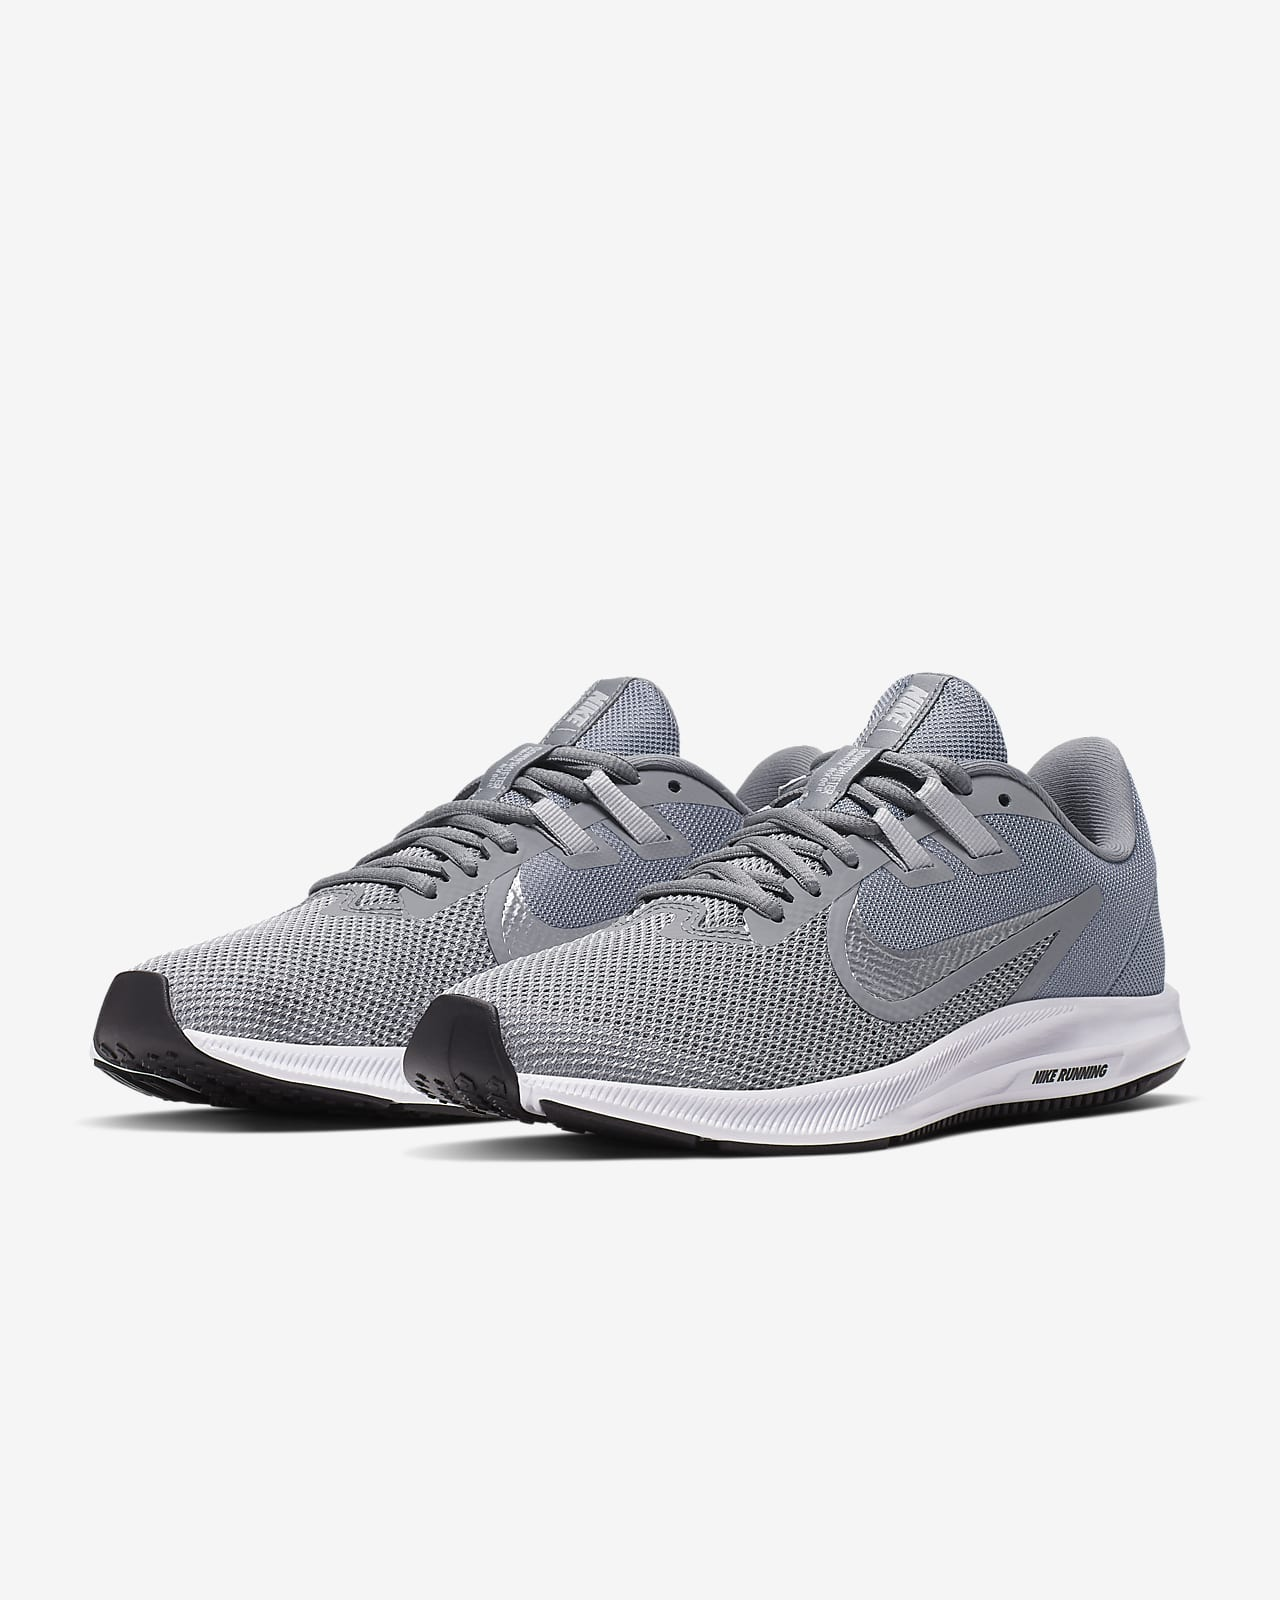 nike white gray shoes